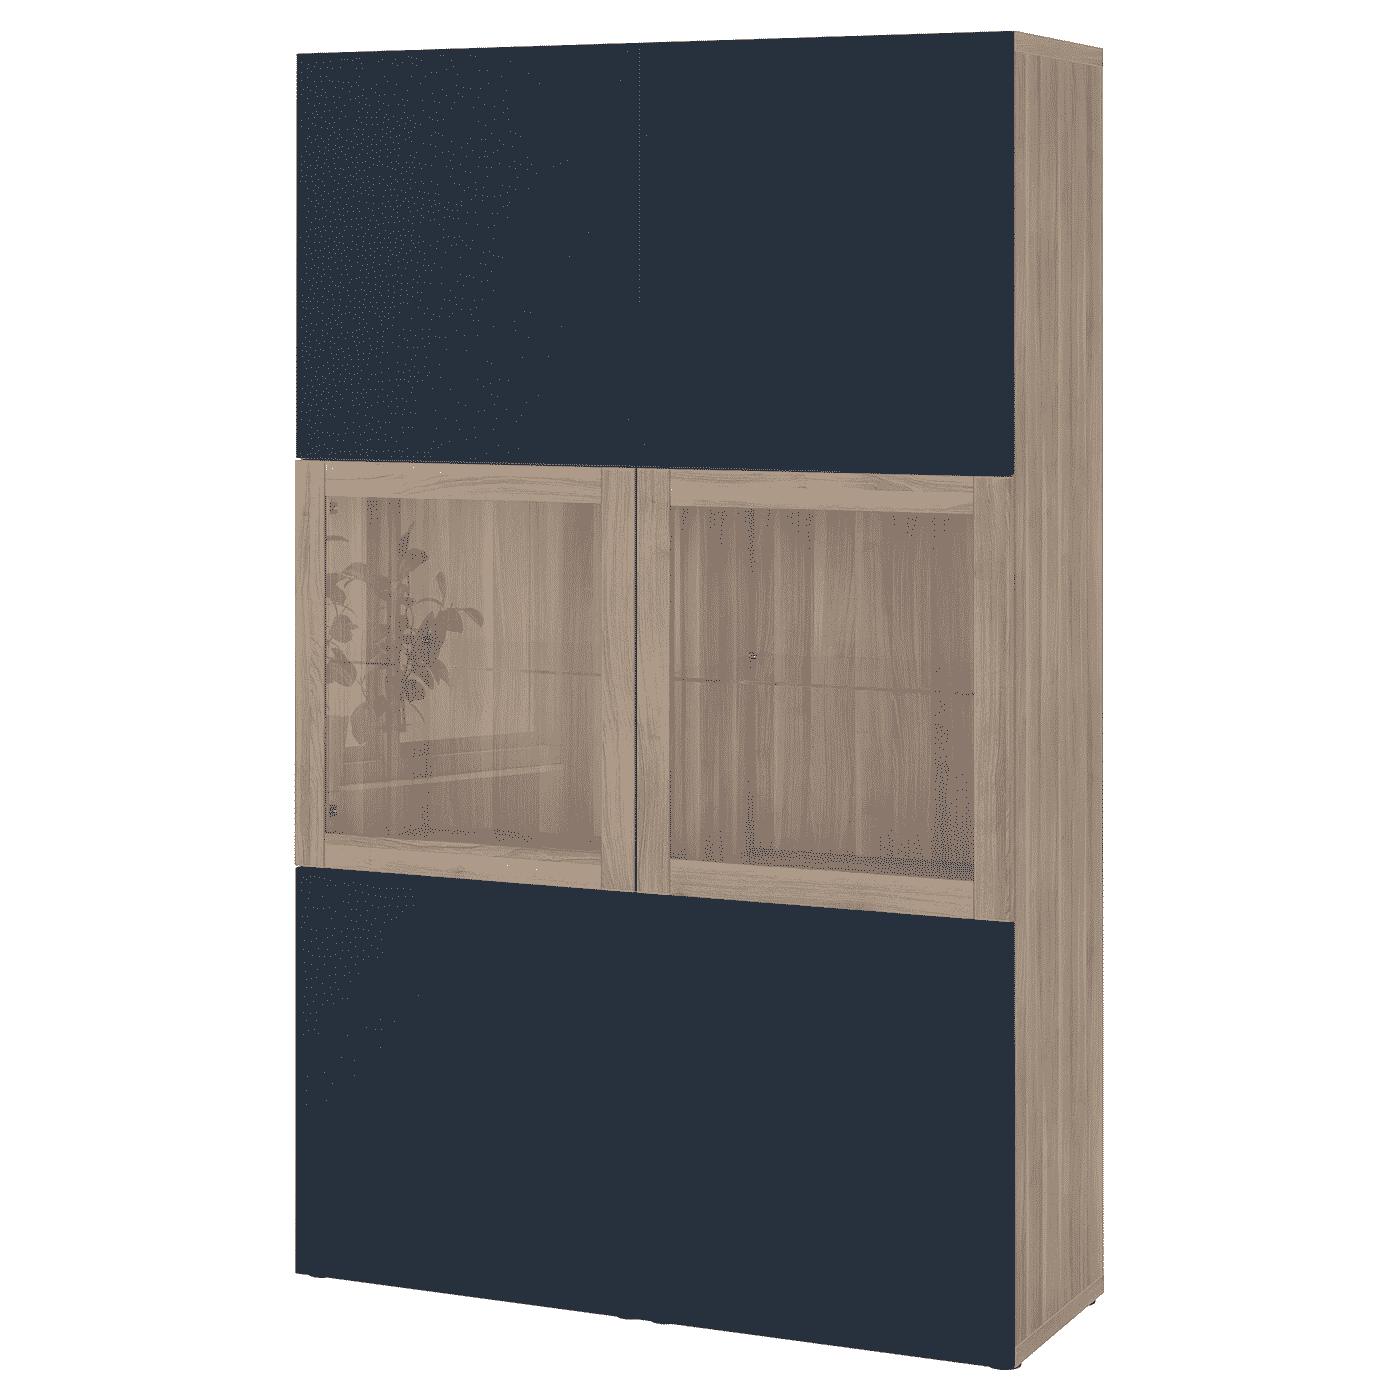 The BESTA Bookshelf